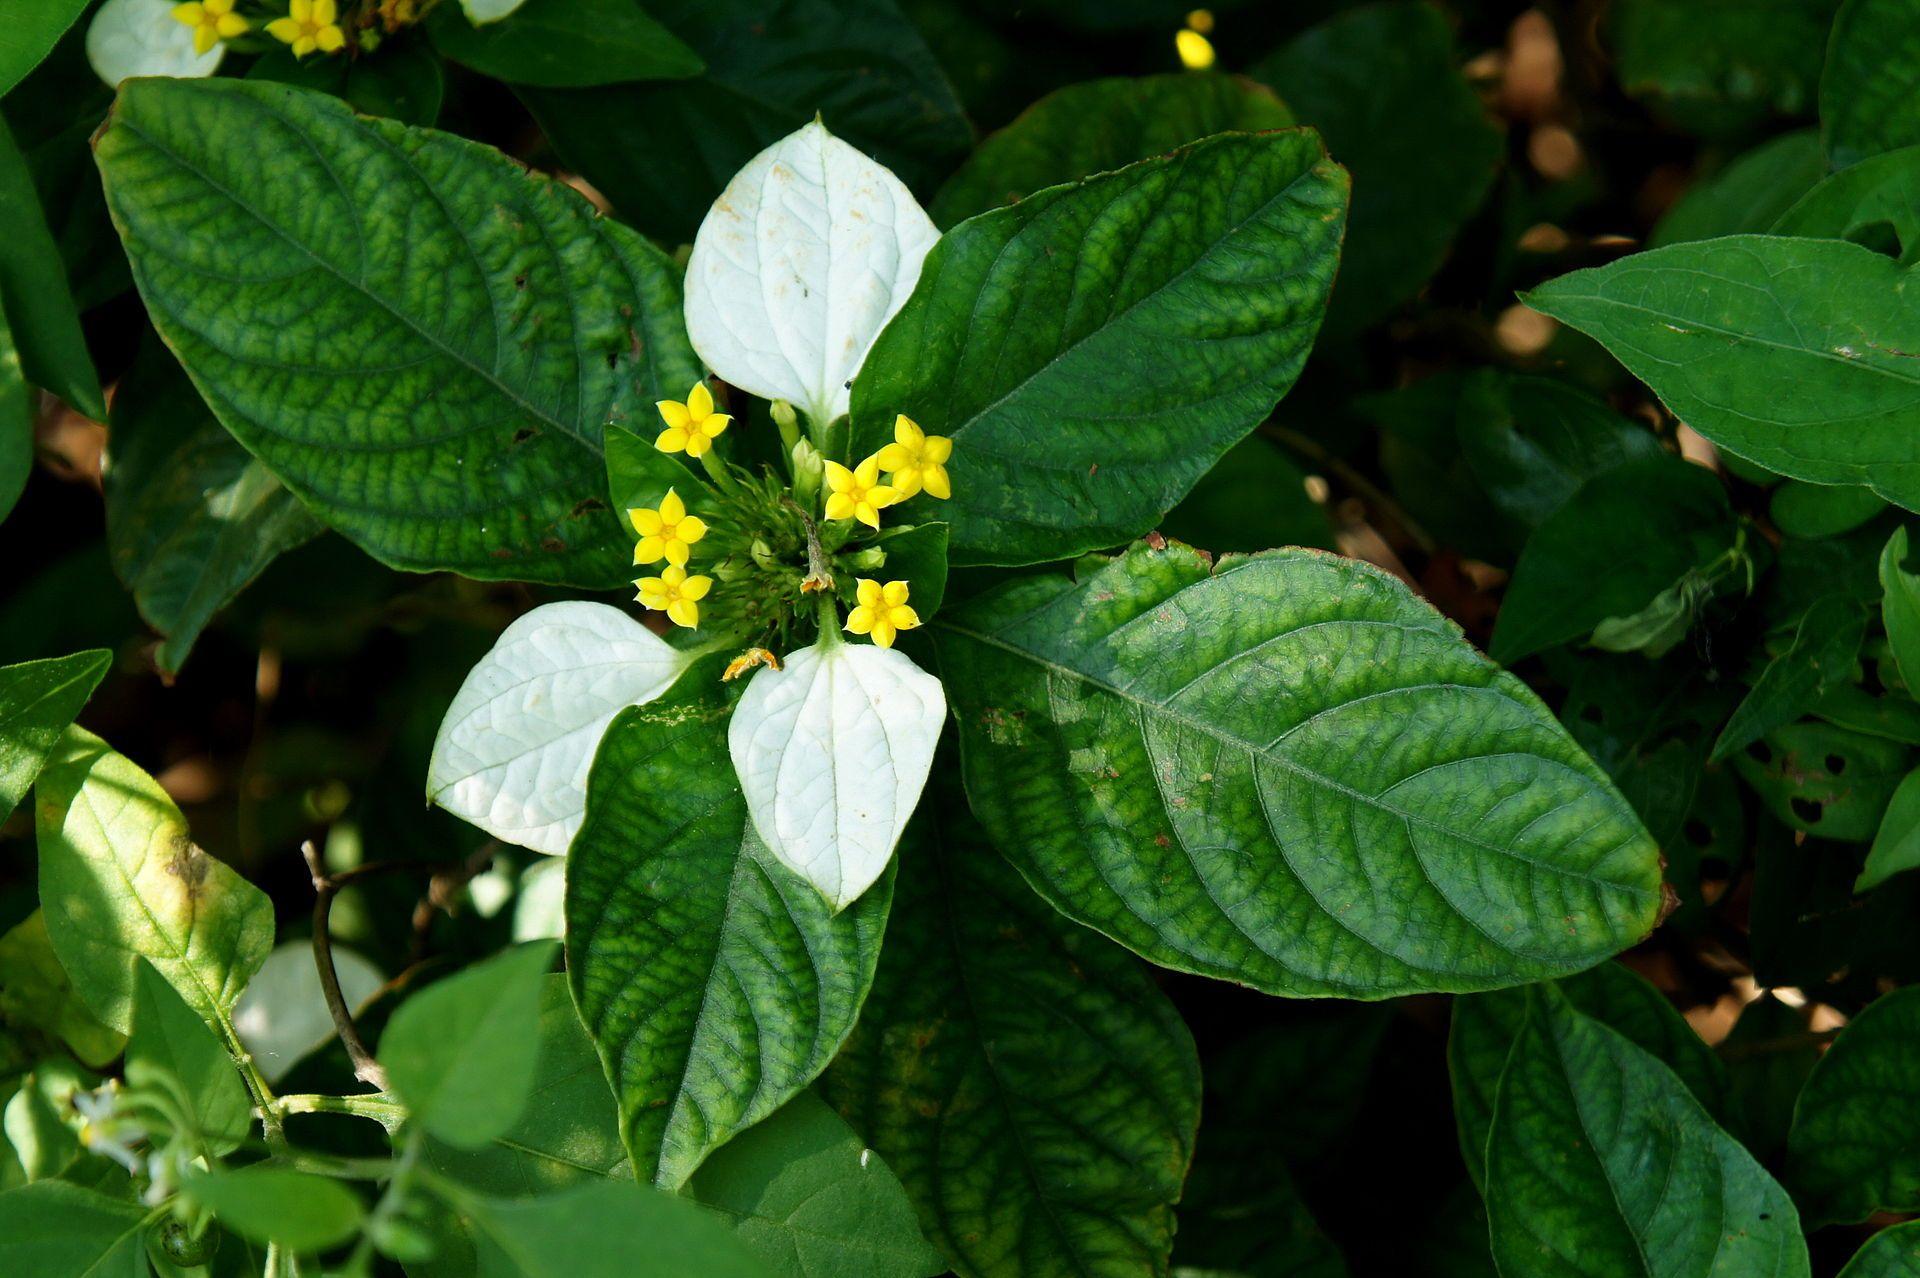 Mussaenda pubescens buddhas lampg flower plants mussaenda pubescens buddhas lampg ccuart Images